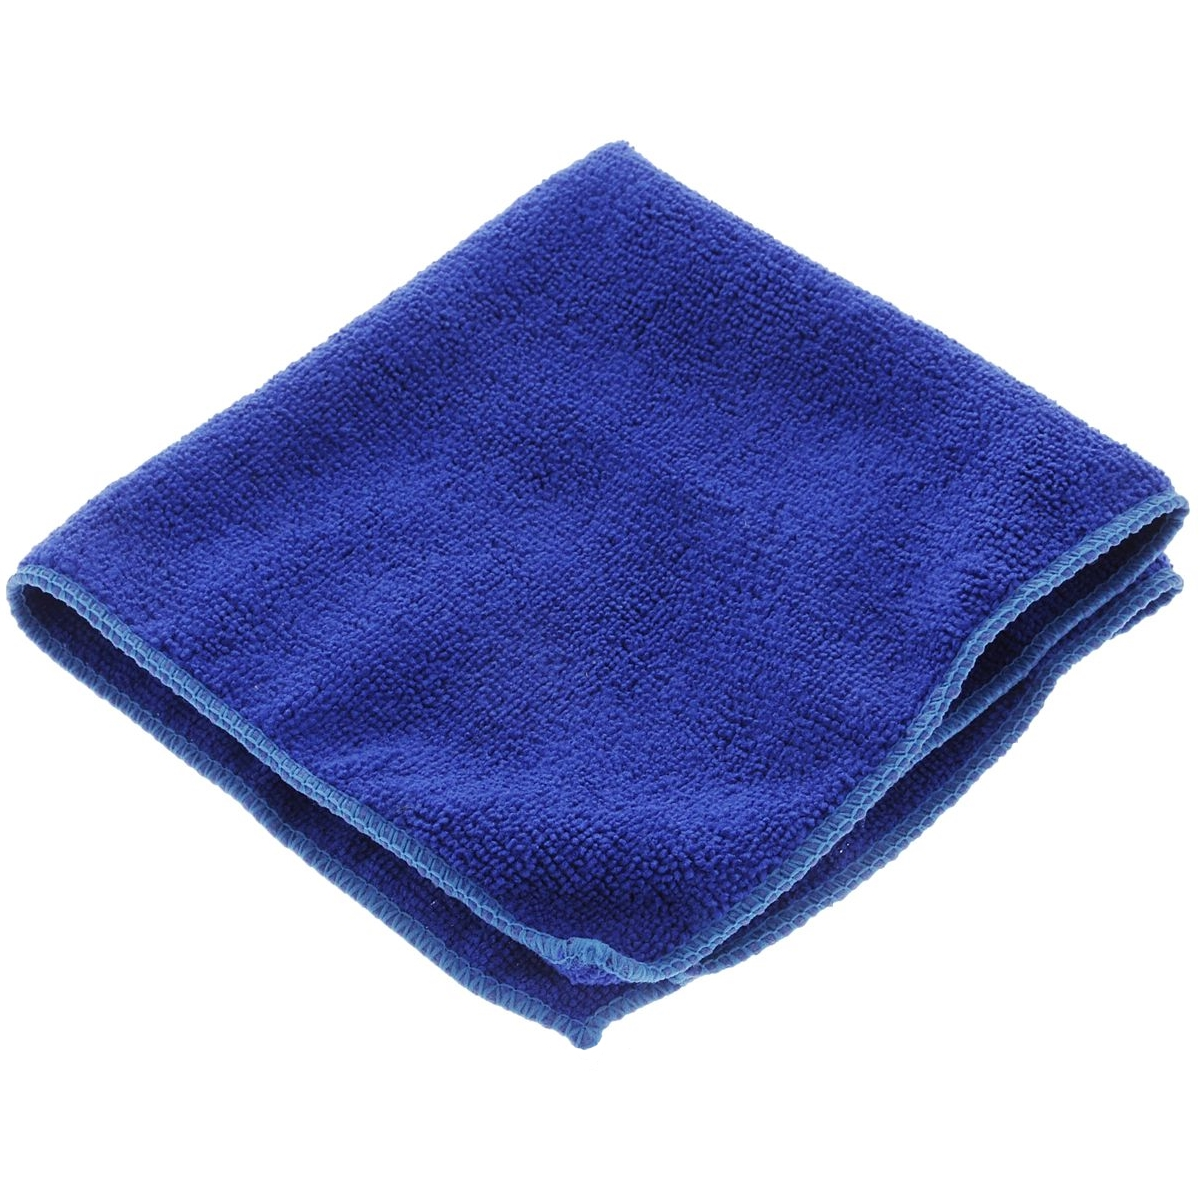 Салфетка 30х30см, микрофибра, 220г/м2, синяя